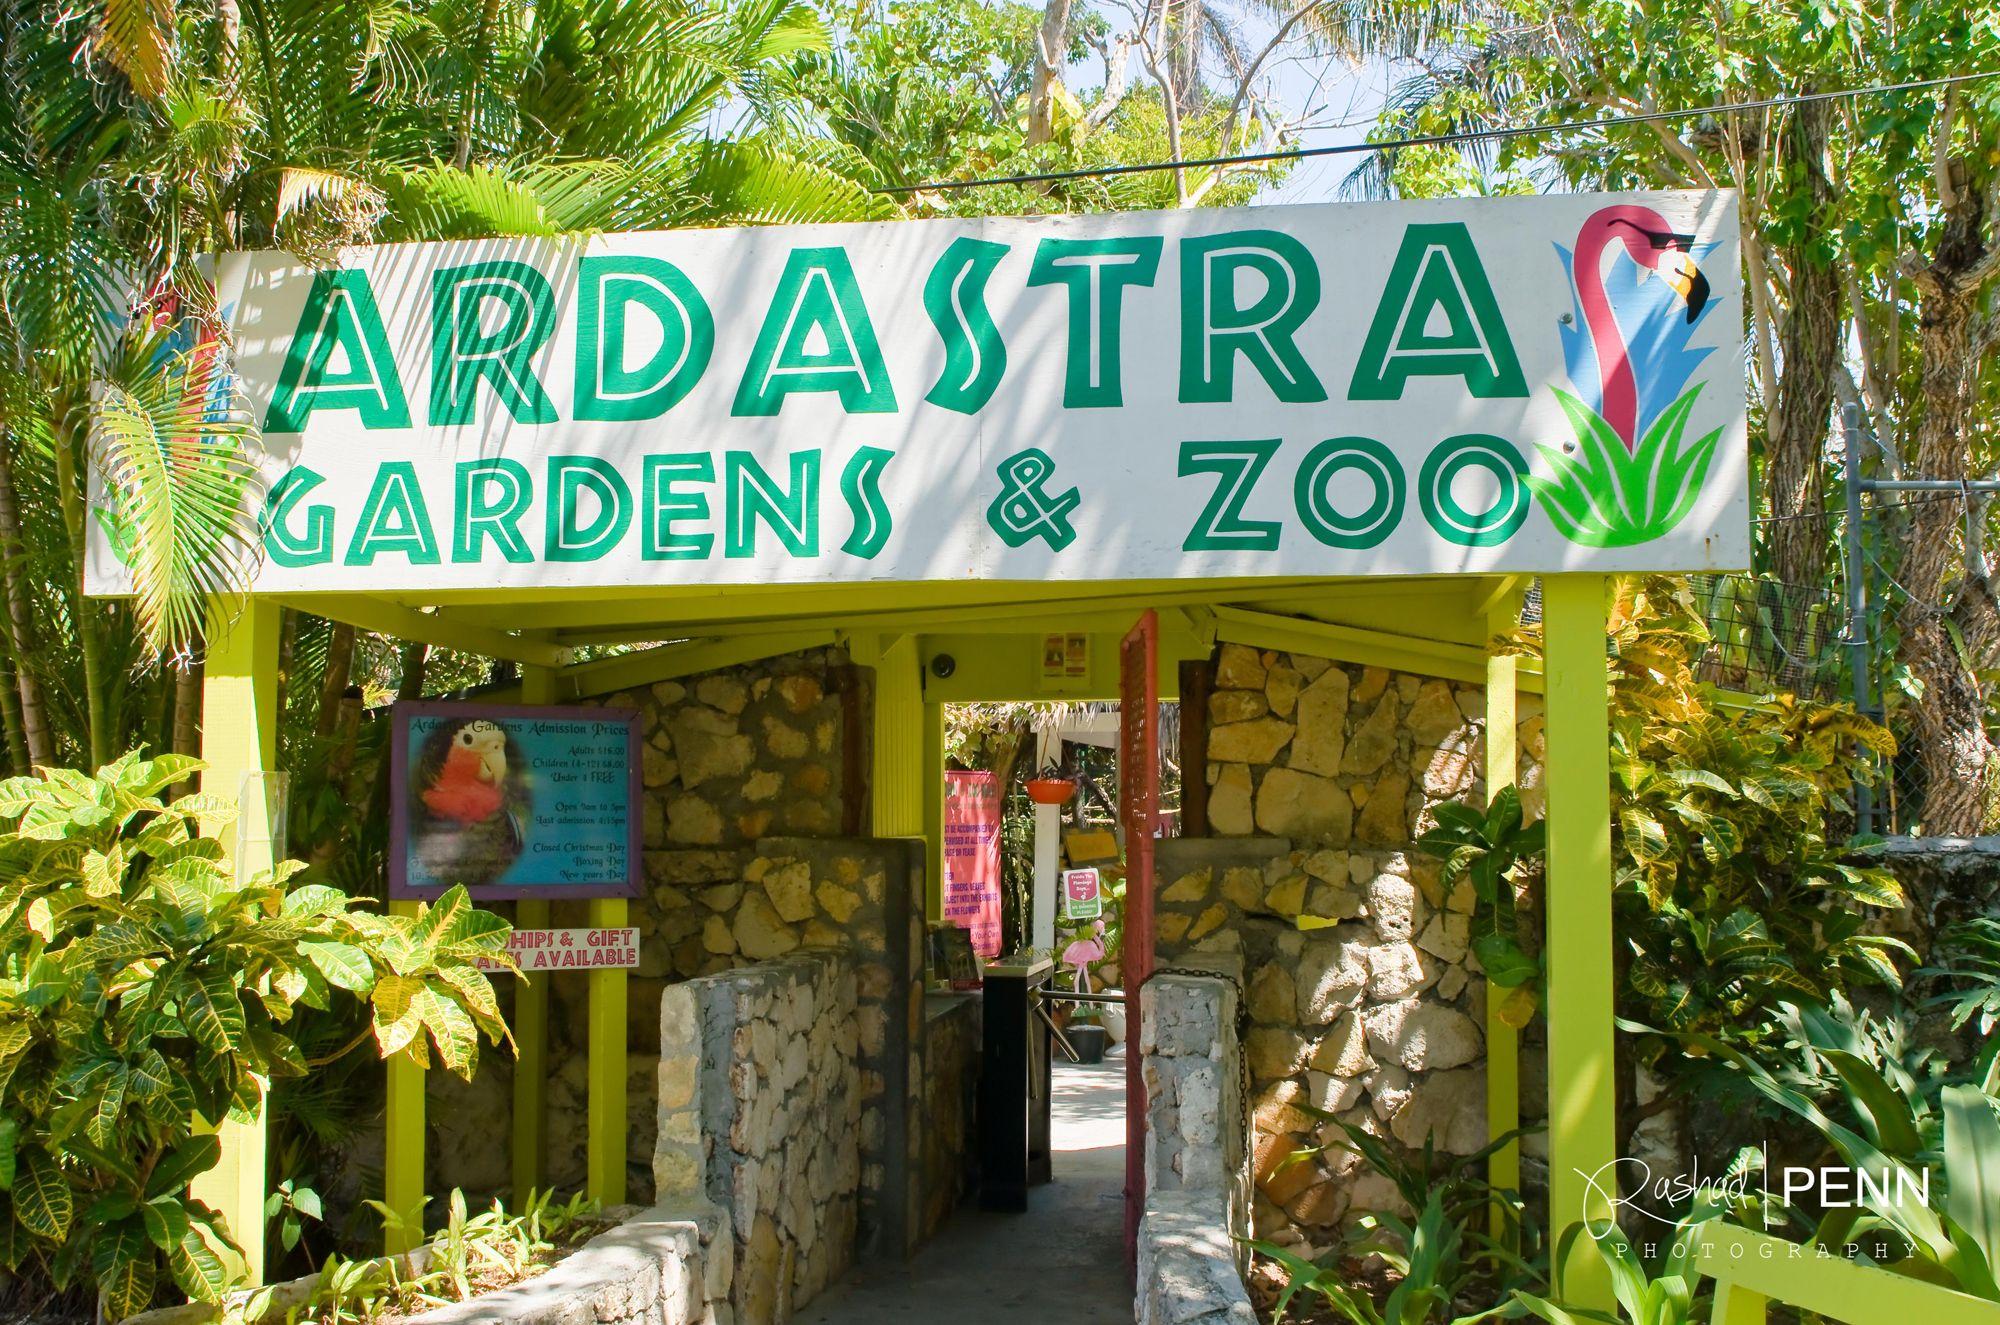 fe68d7cbe11570b7d2bed4422c445a95 - Nassau Bahamas Ardastra Gardens And Zoo